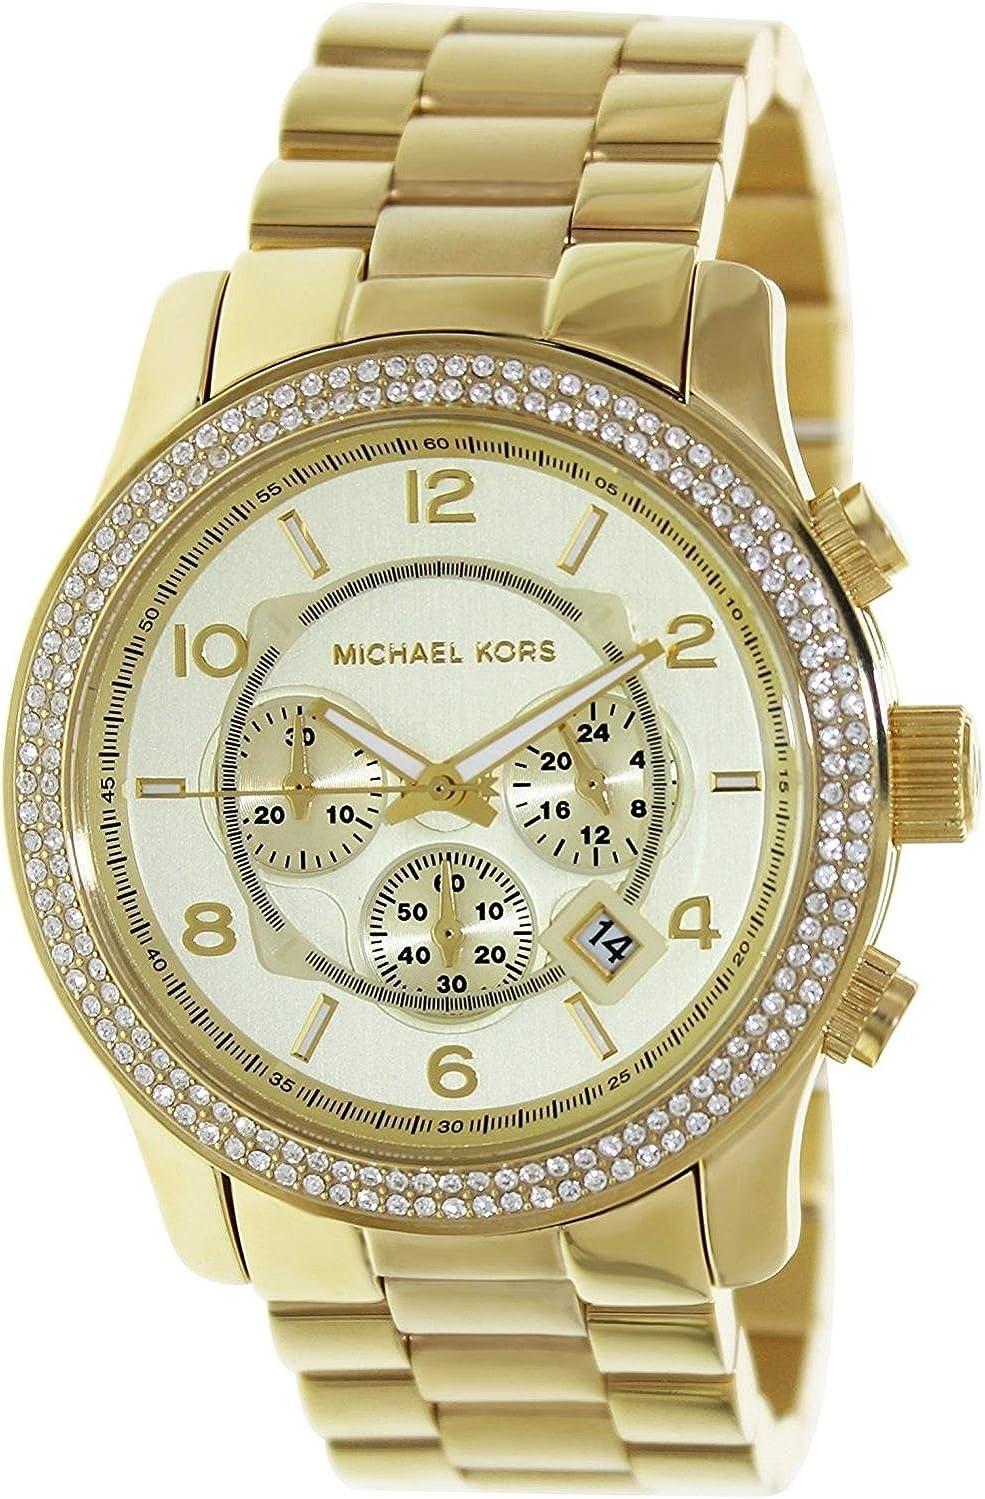 Michael Kors MK5575 Women s Watch